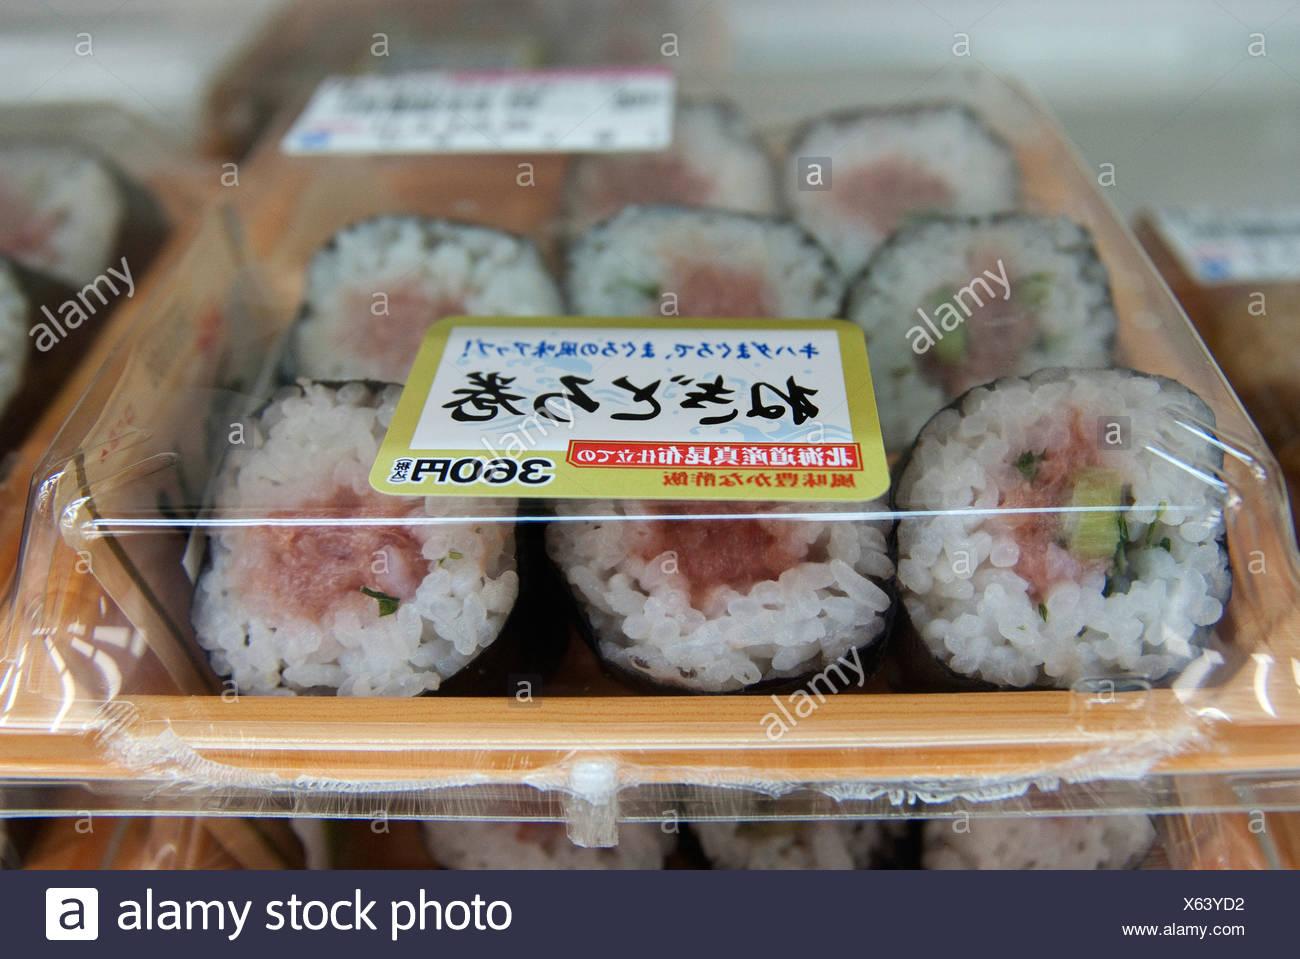 ASIAN FOOD - Stock Image